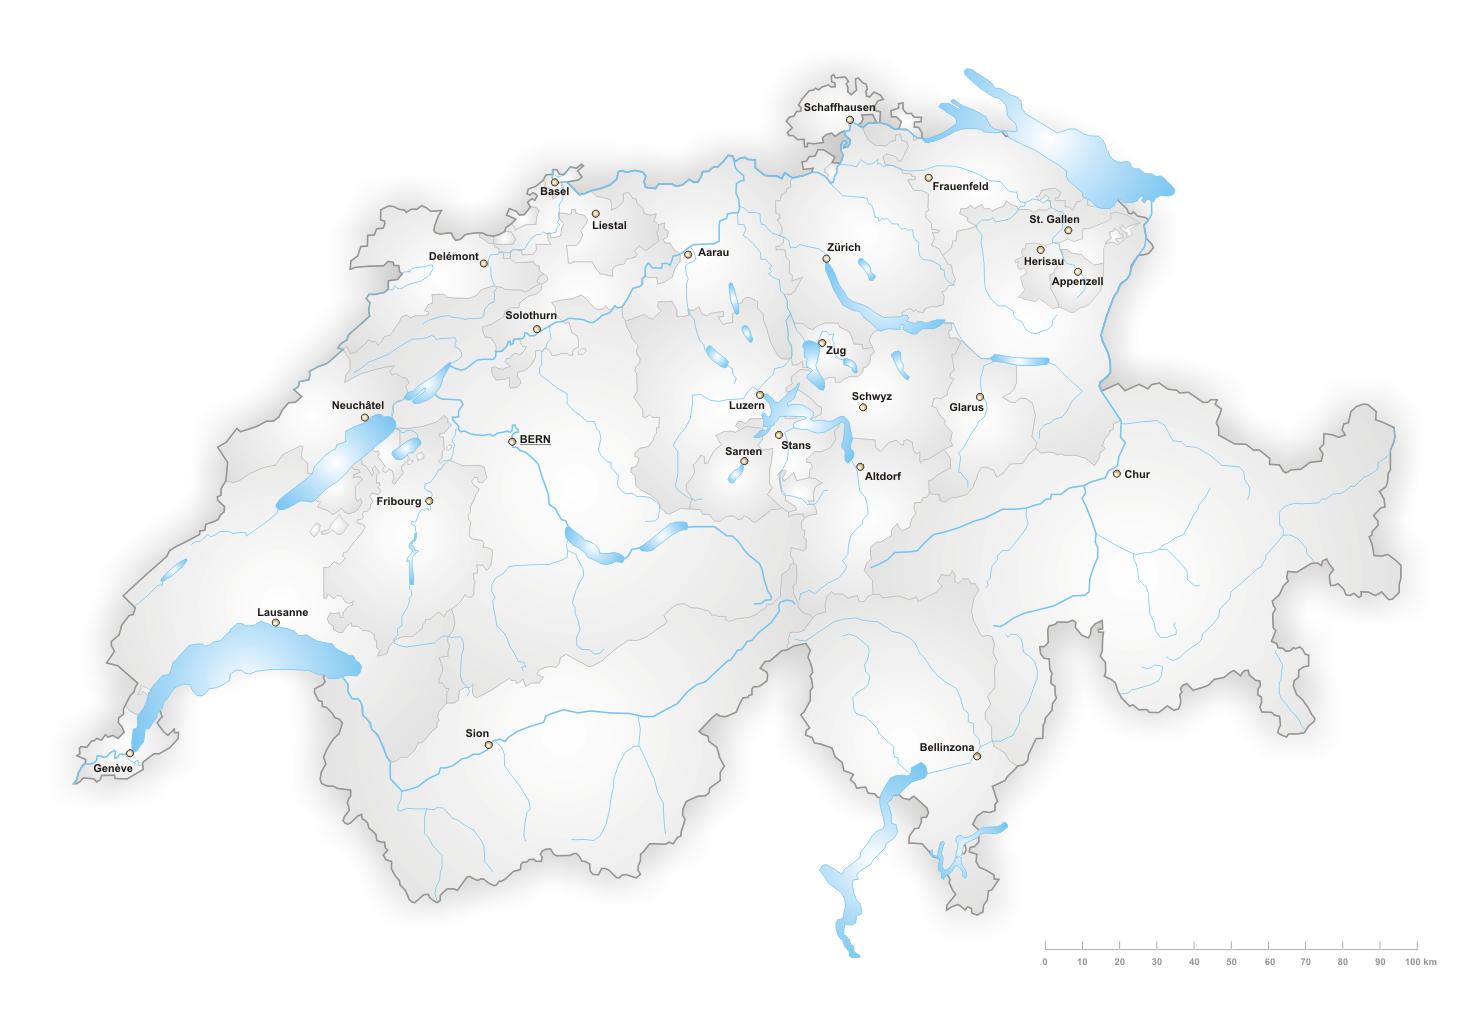 Landkarte Asien Ohne Namen.Landkarte Schweiz Landkarten Download Schweizkarte